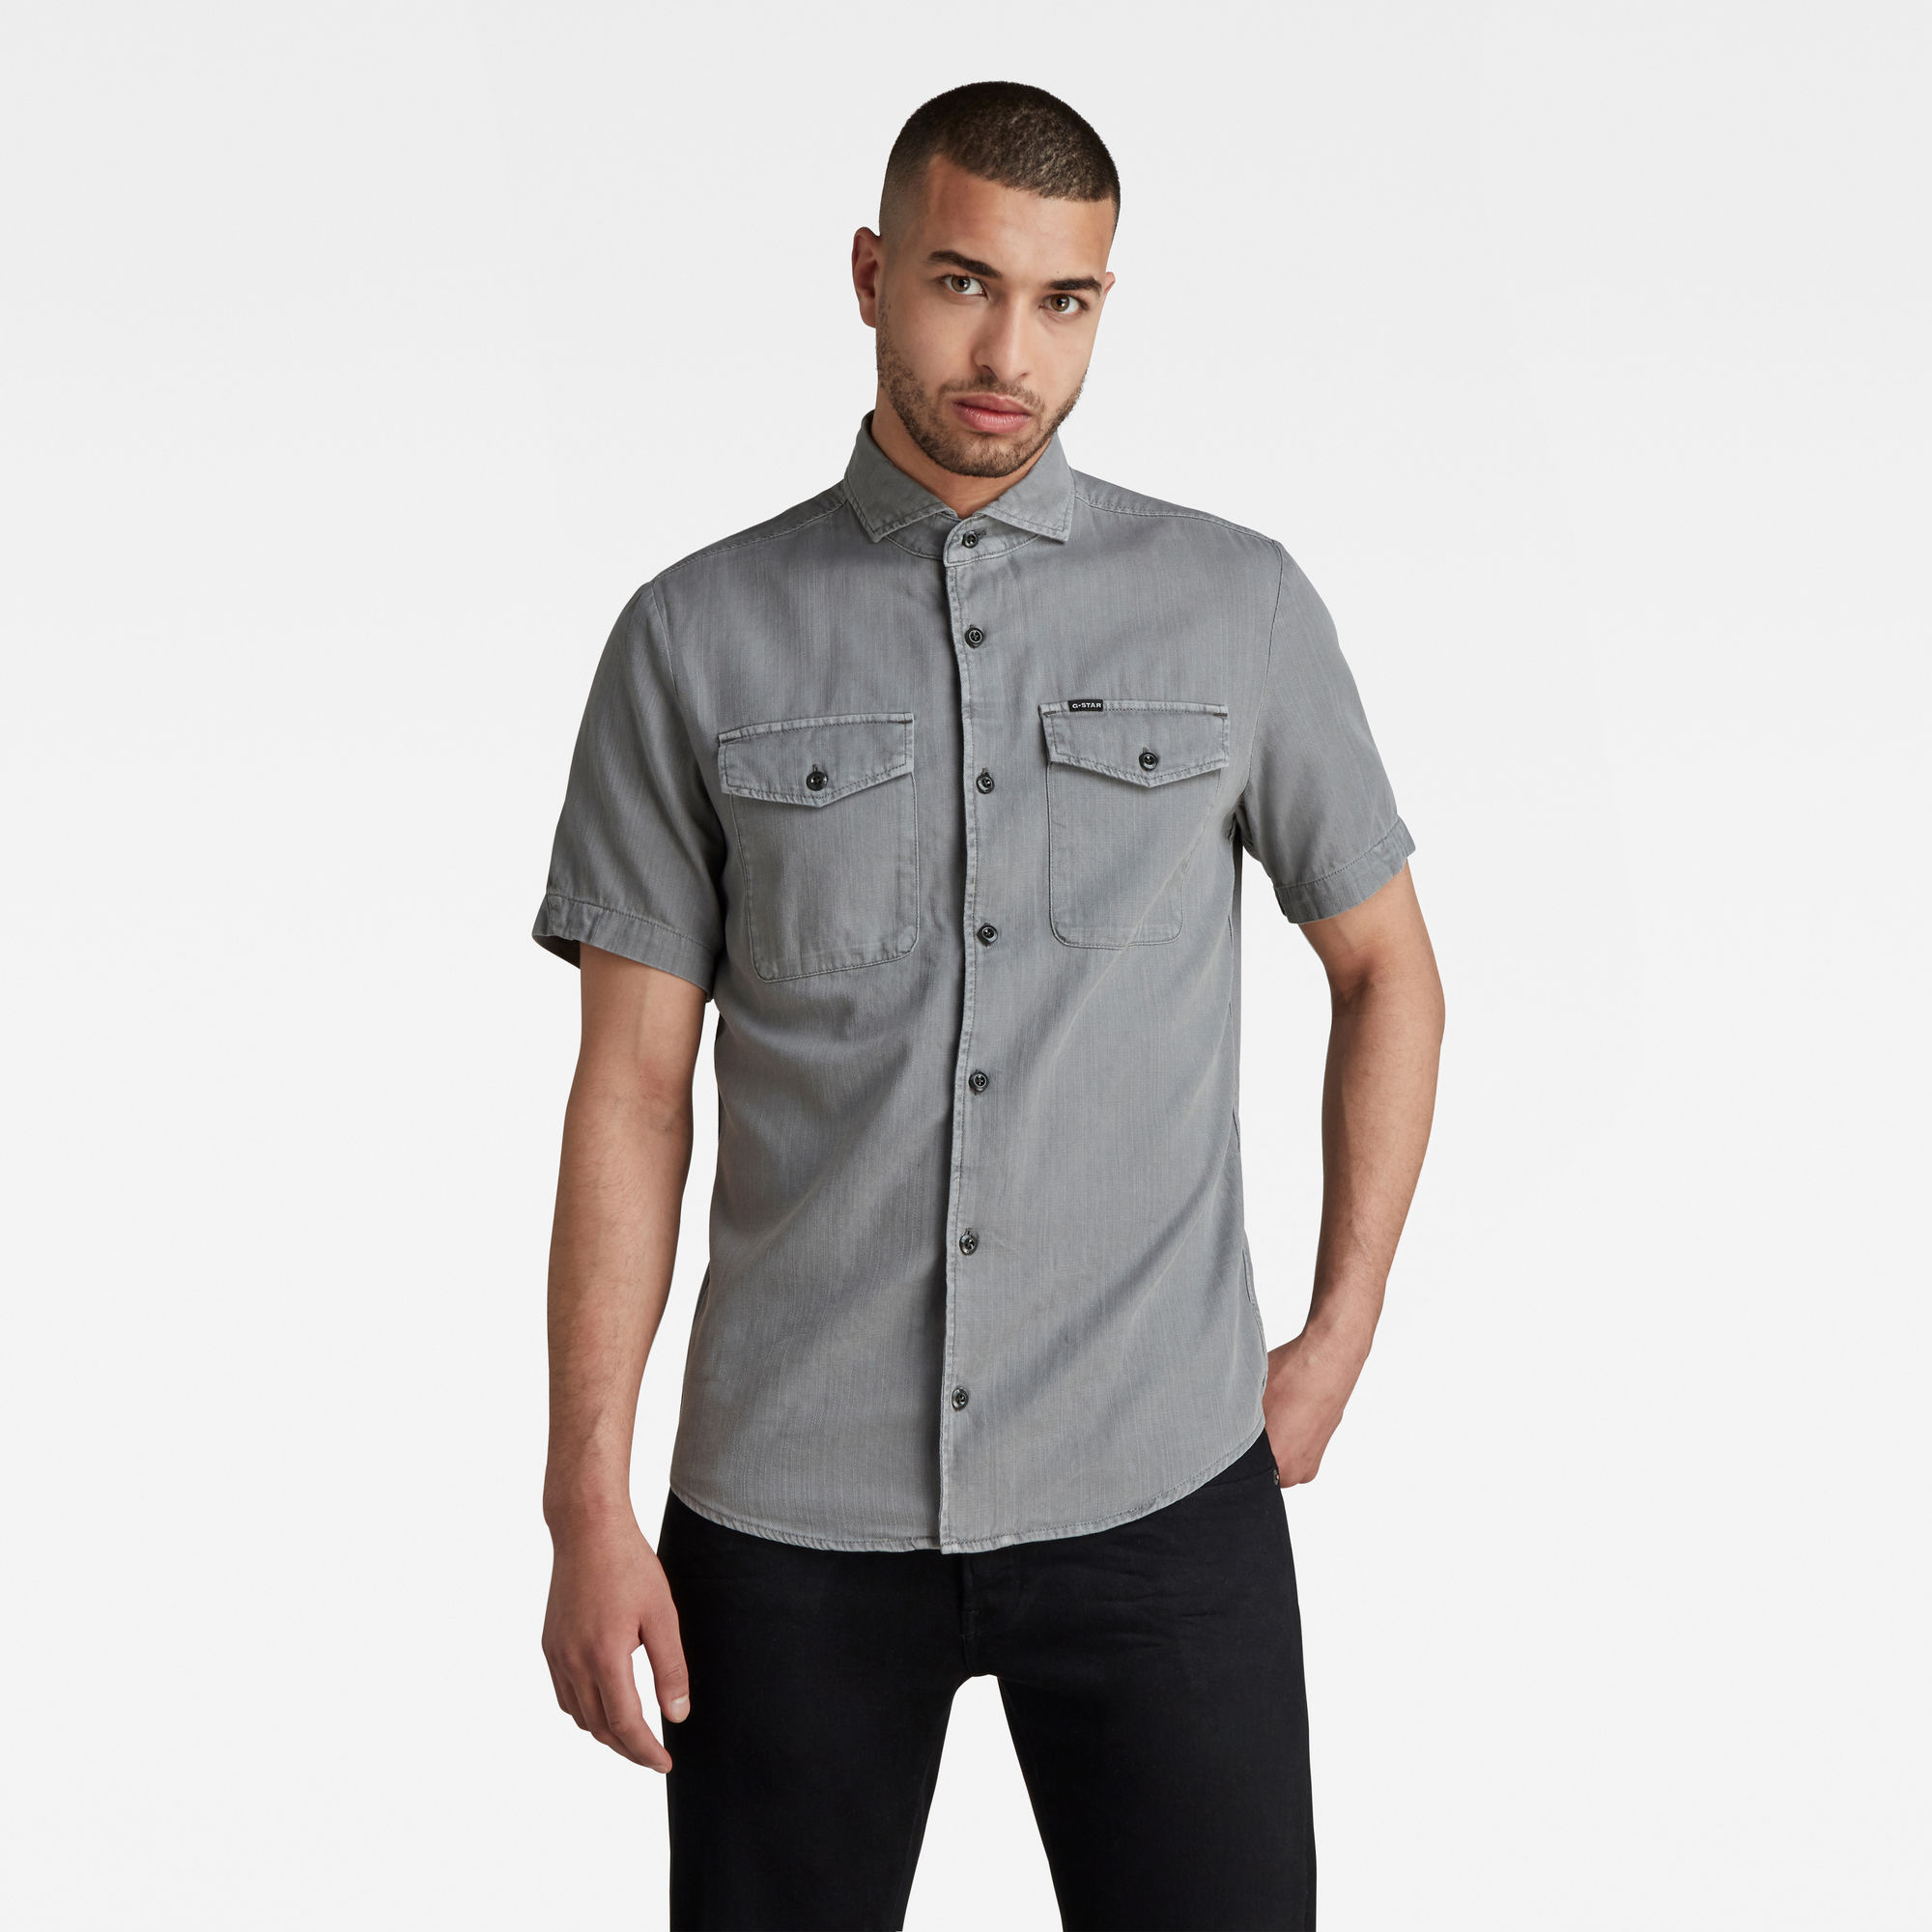 G-Star RAW Heren Marine Service Slim Shirt Grijs